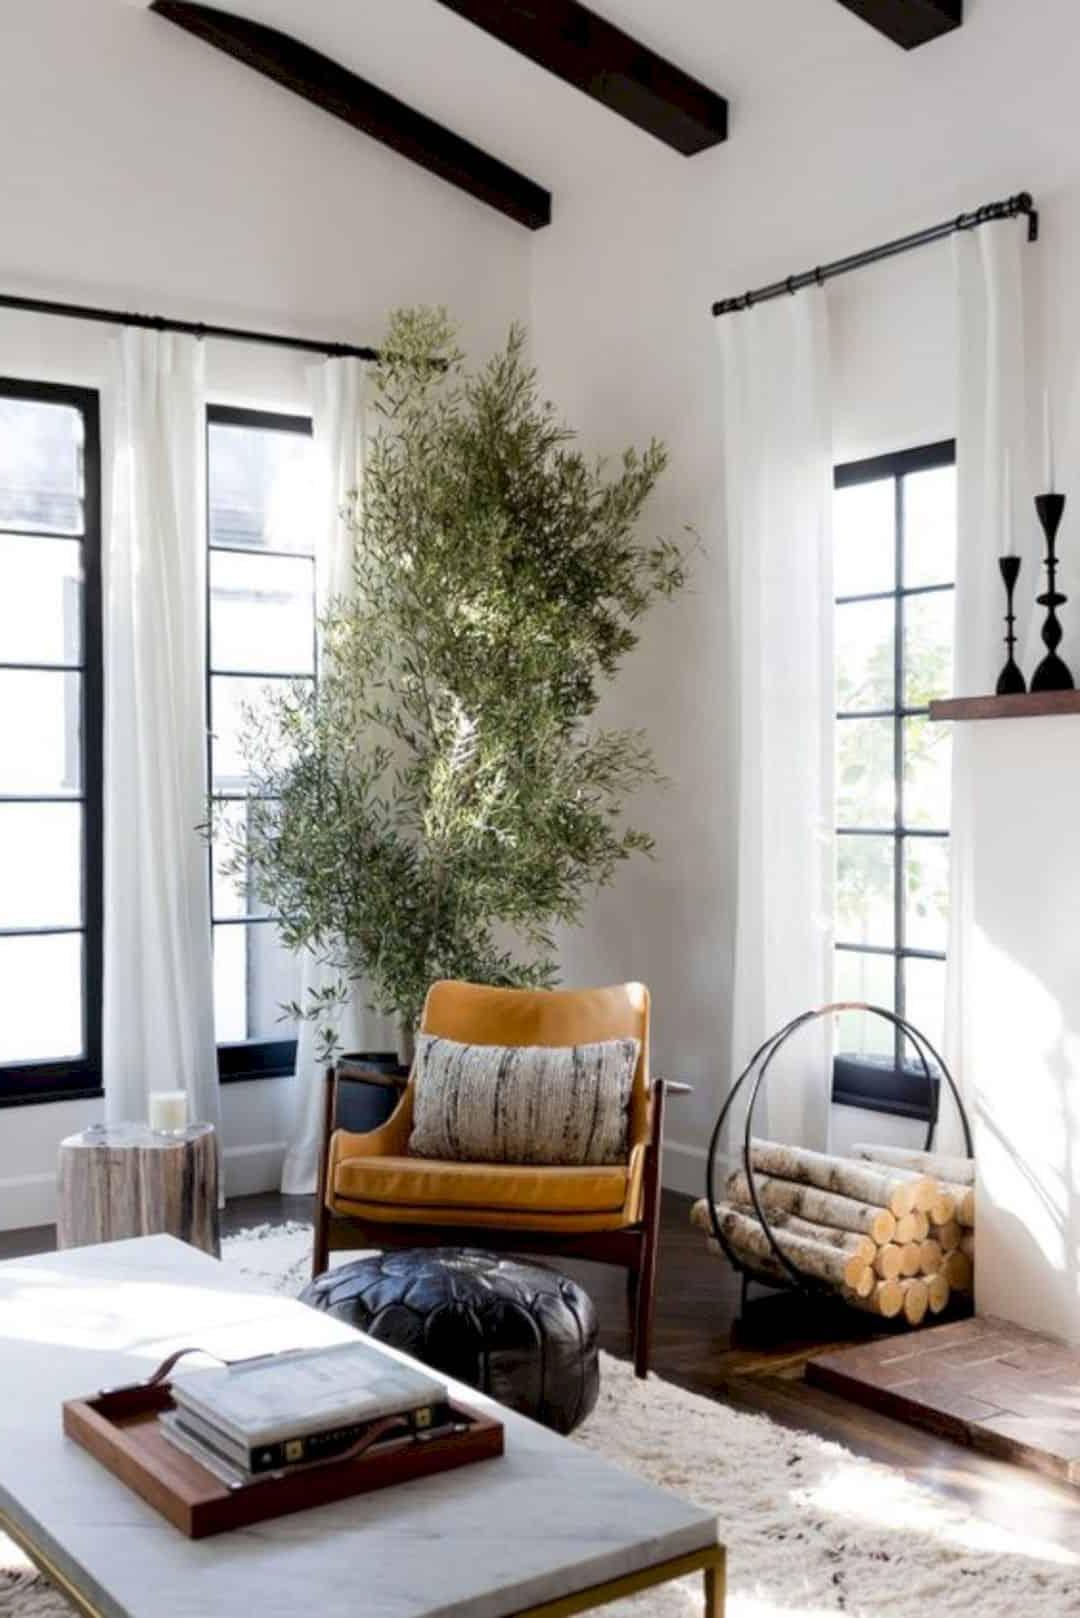 17 Stunning Interior Design Ideas For Living Room